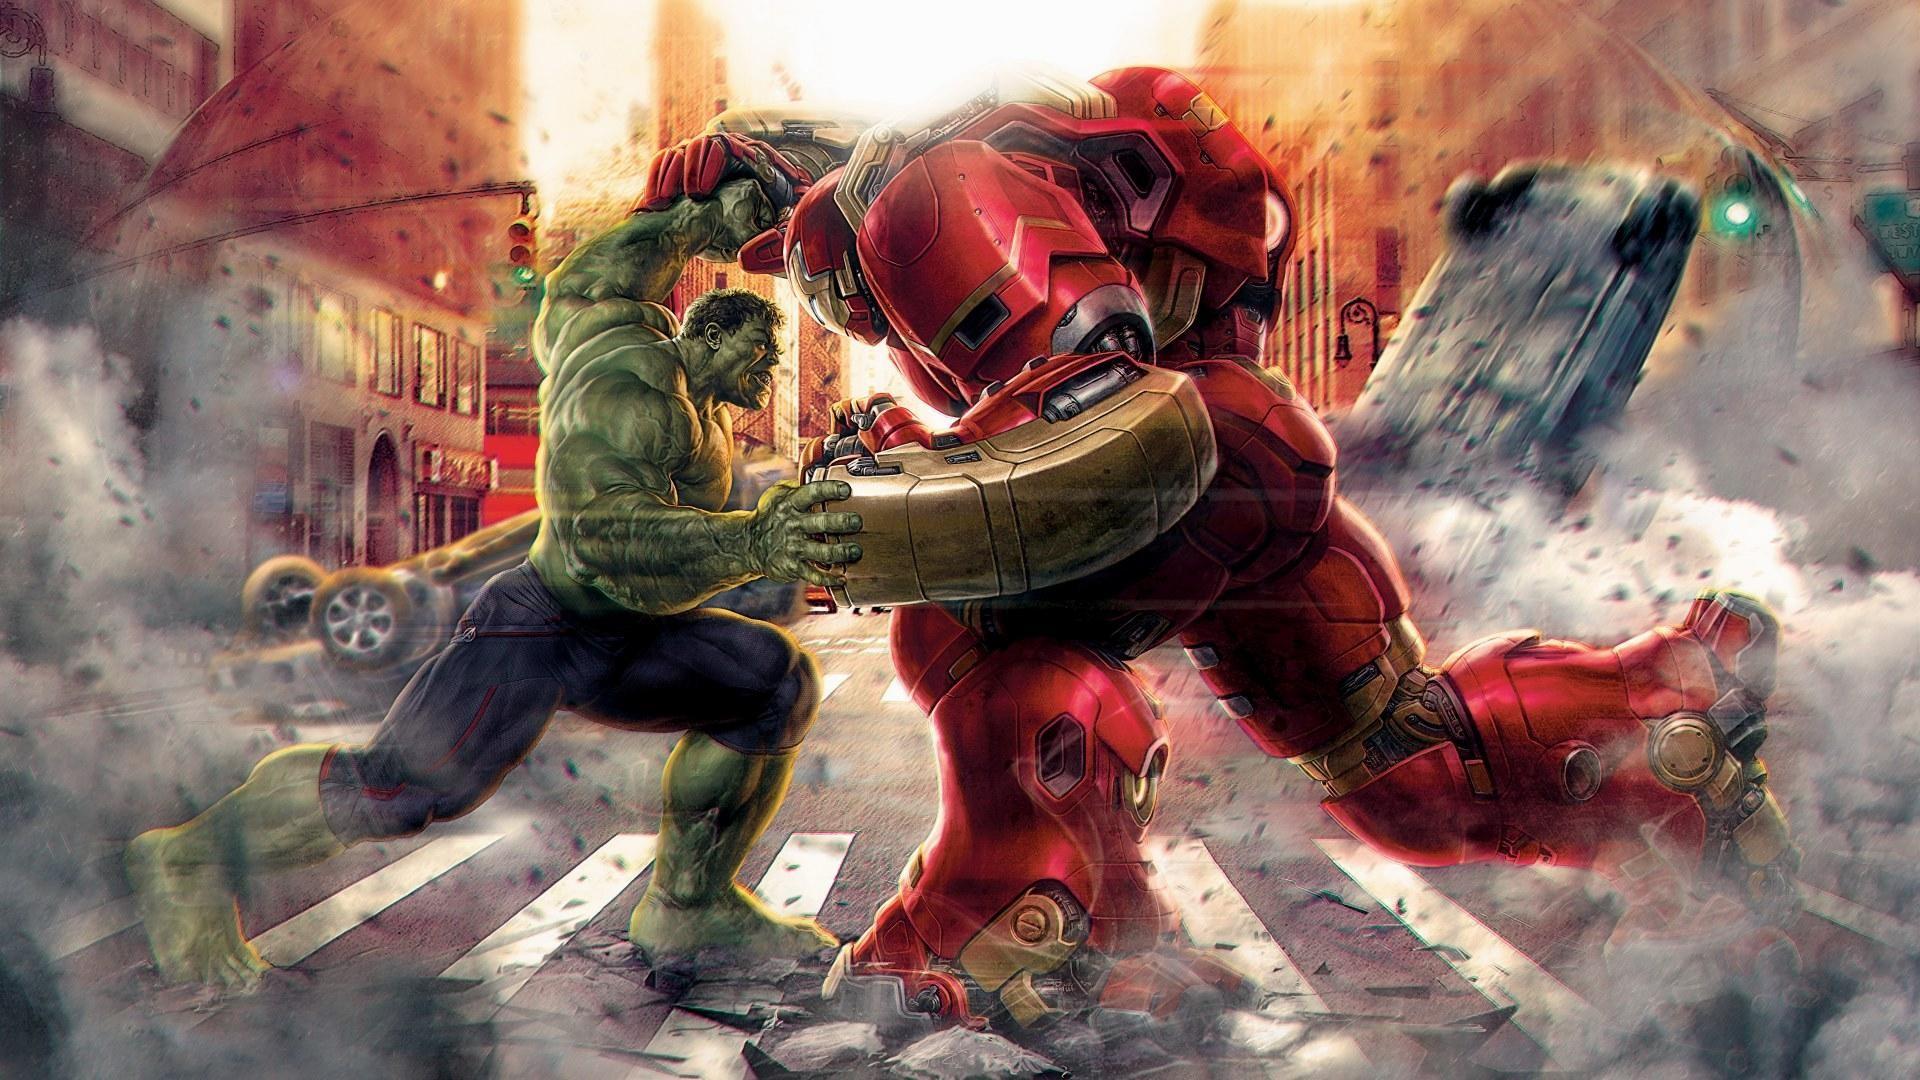 Hulk-vs-Hulkbuster-Avengers-Age-of-Ultron-by-